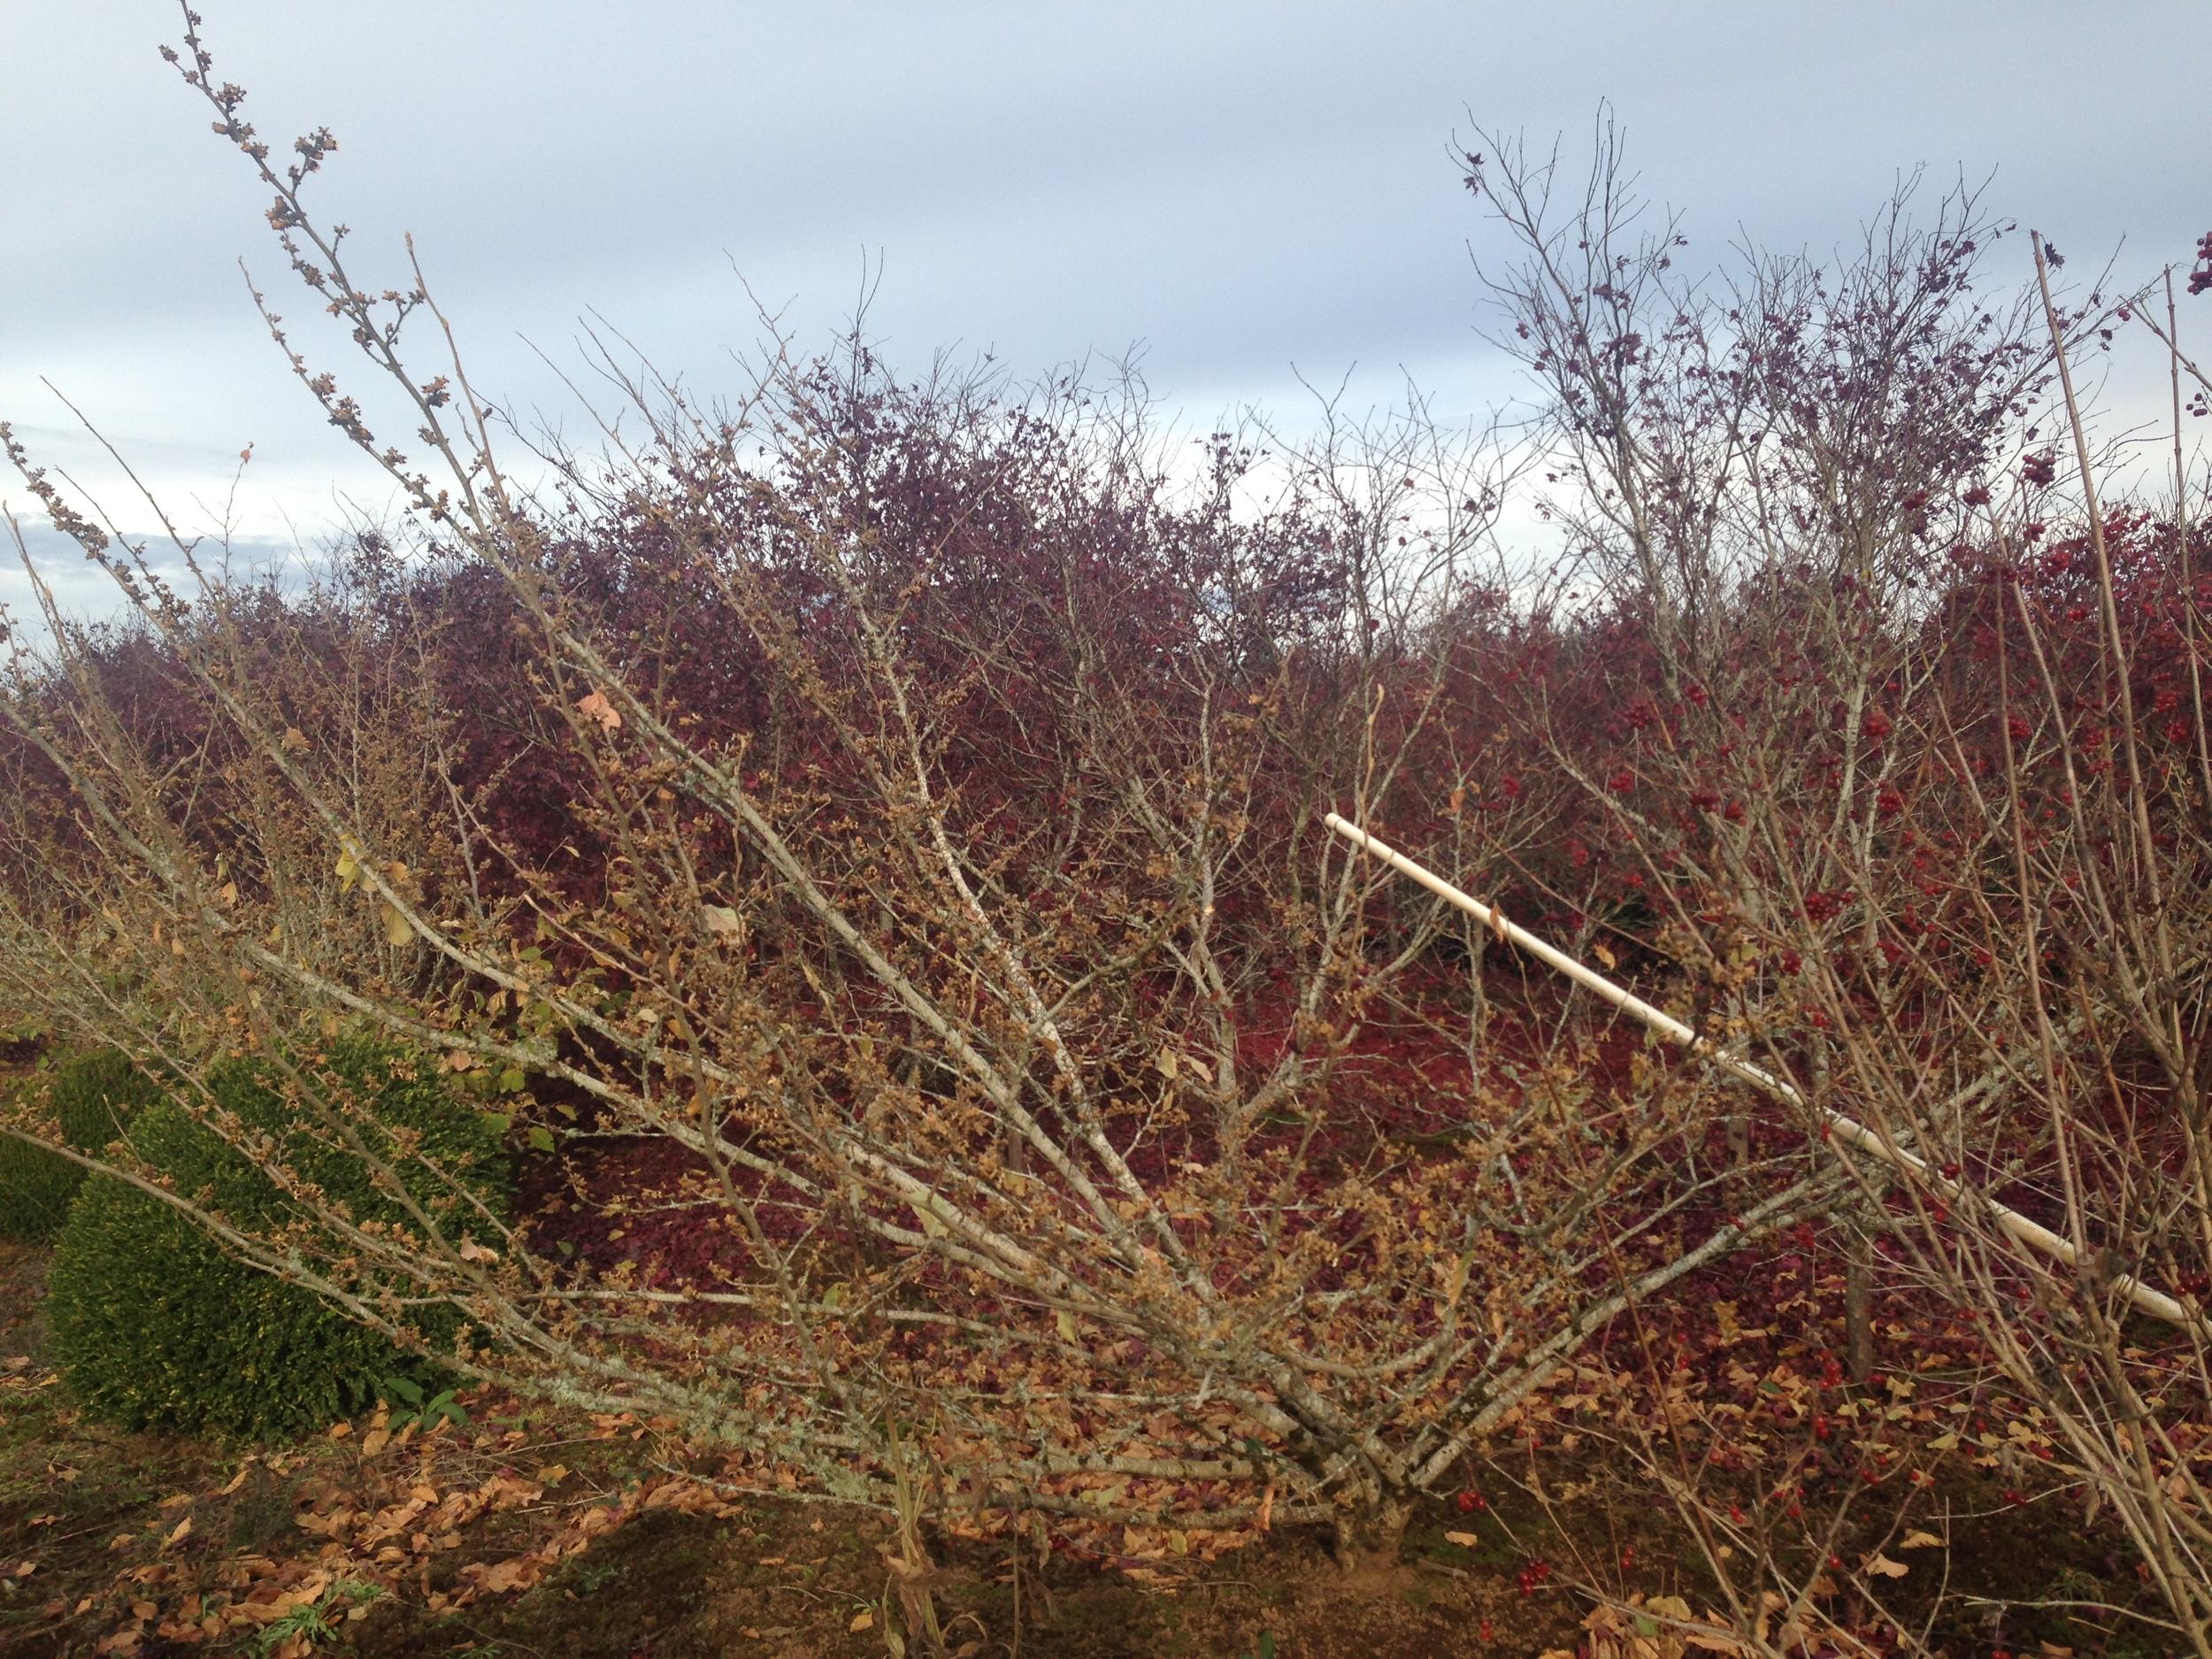 Hamamelis x int.  'Jelena' & 'Copper Beauty'  shrub forms